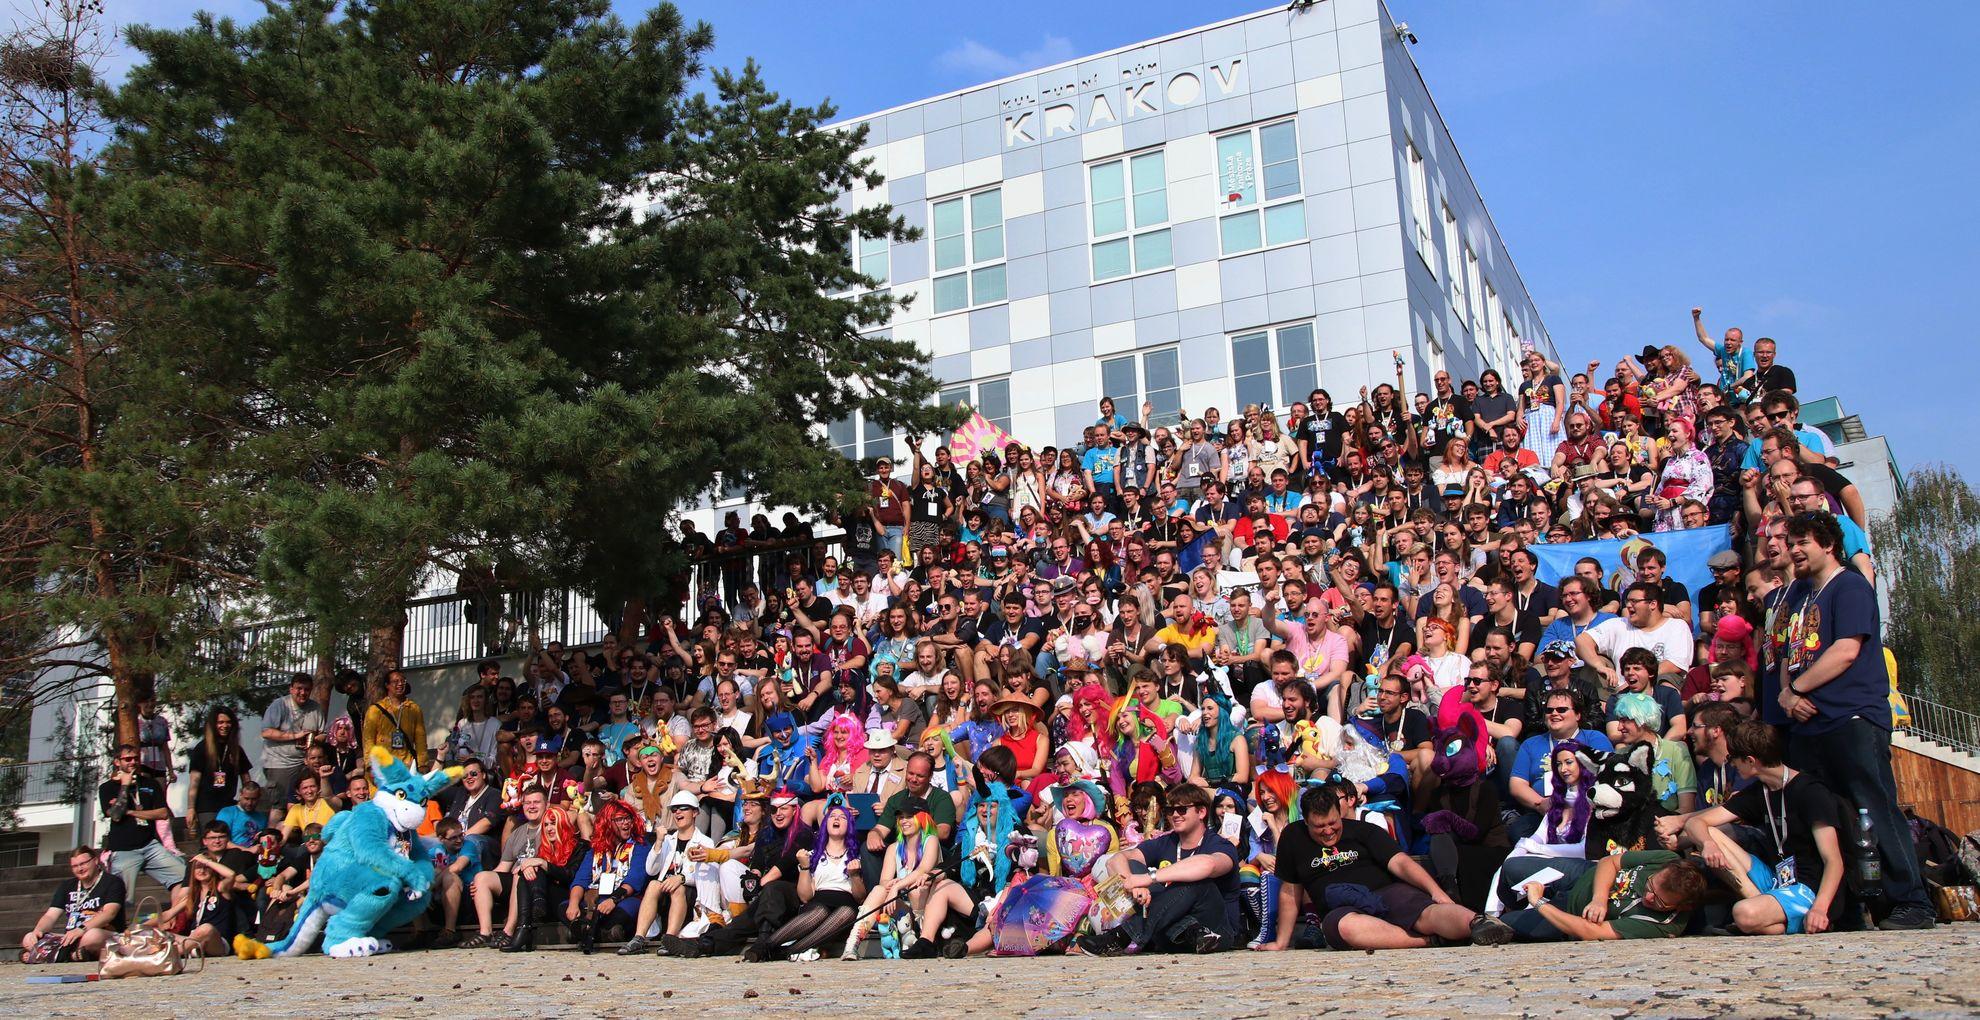 Czequestria 2019 – group photo